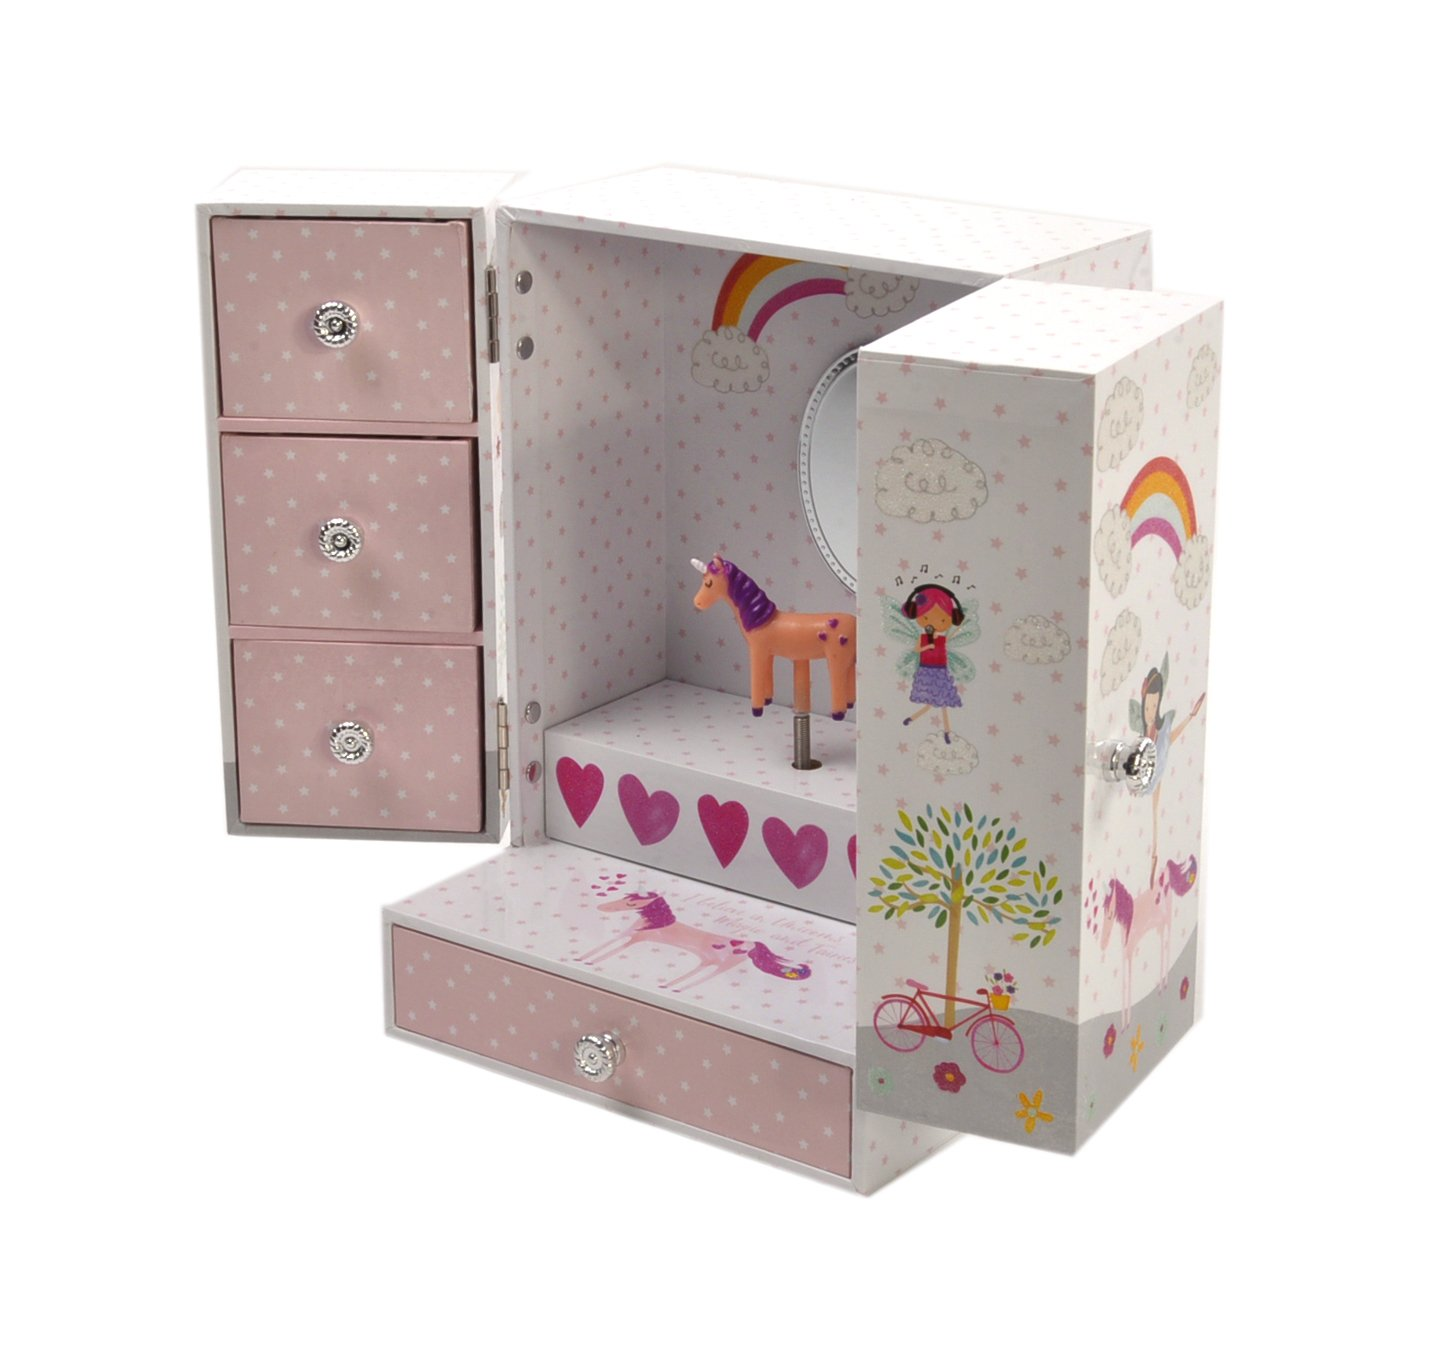 Fairy Unicorn Musical Trinket Jewelery Box or Armoire